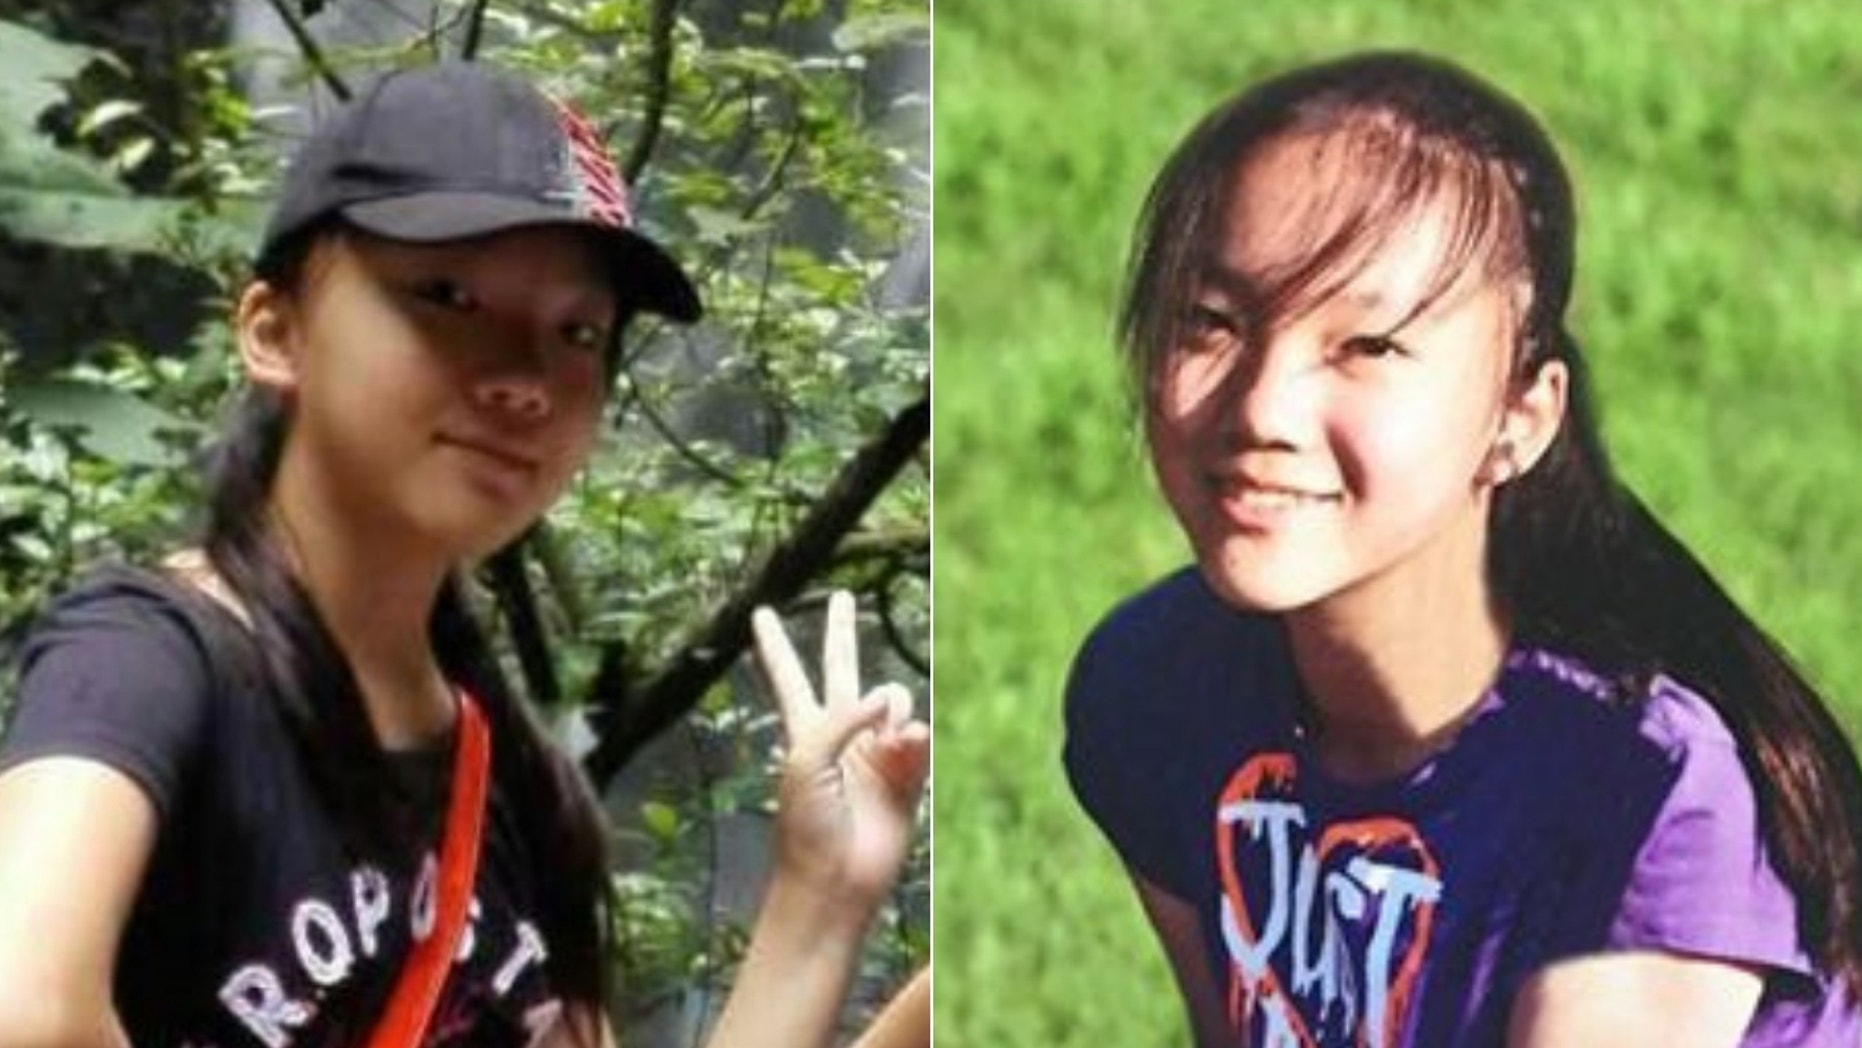 Marrisa Shen was found dead in July 2017. Police made an arrest in her murder case last Friday.